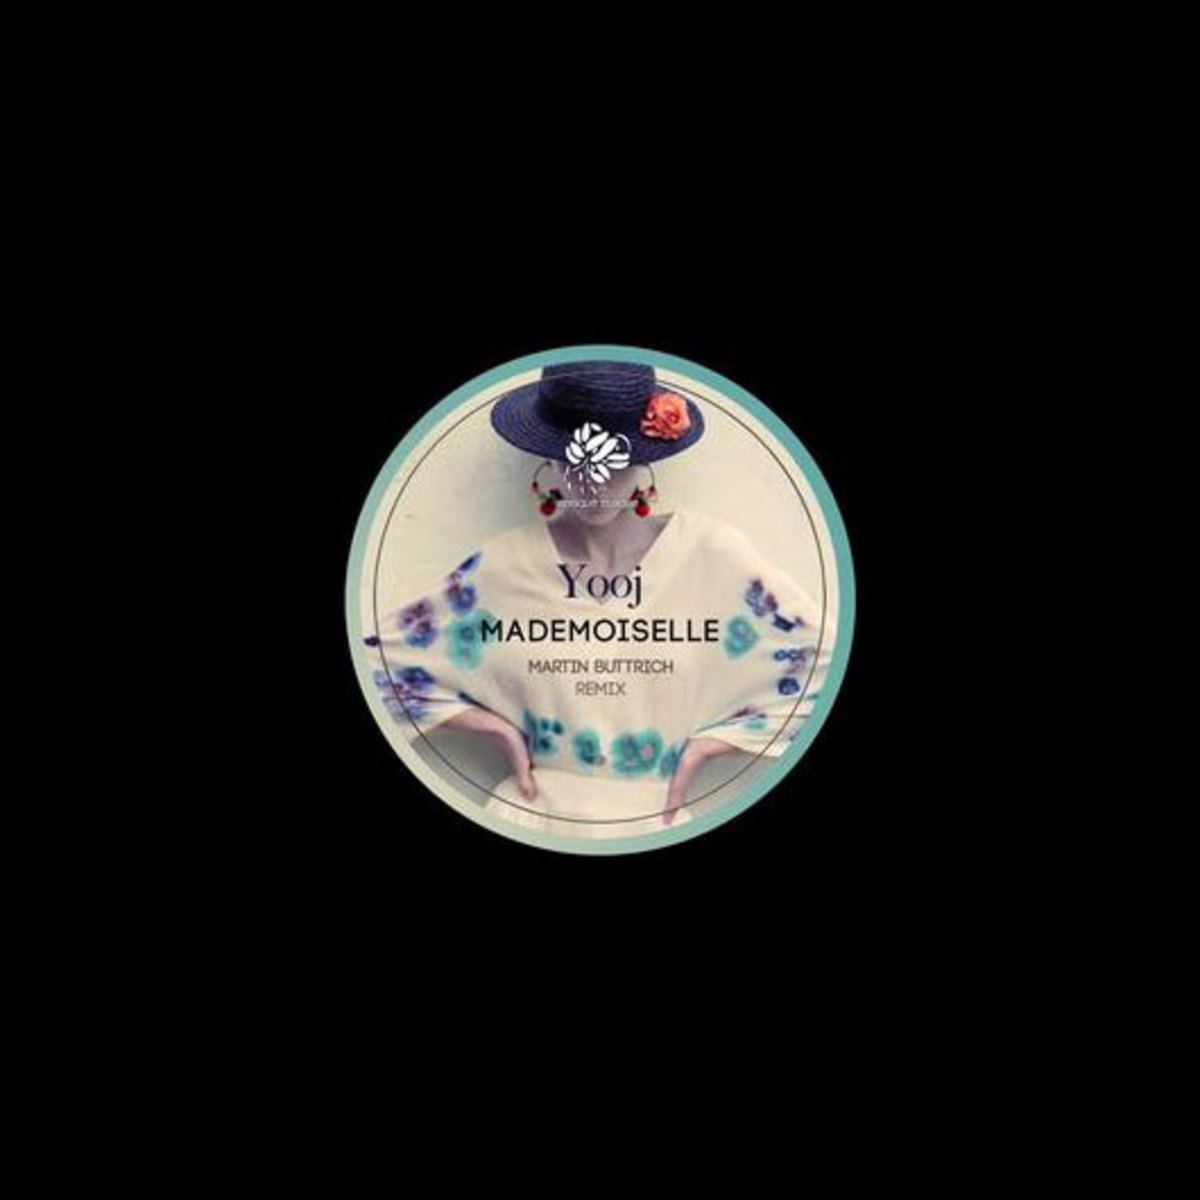 Monique_musique-yooj